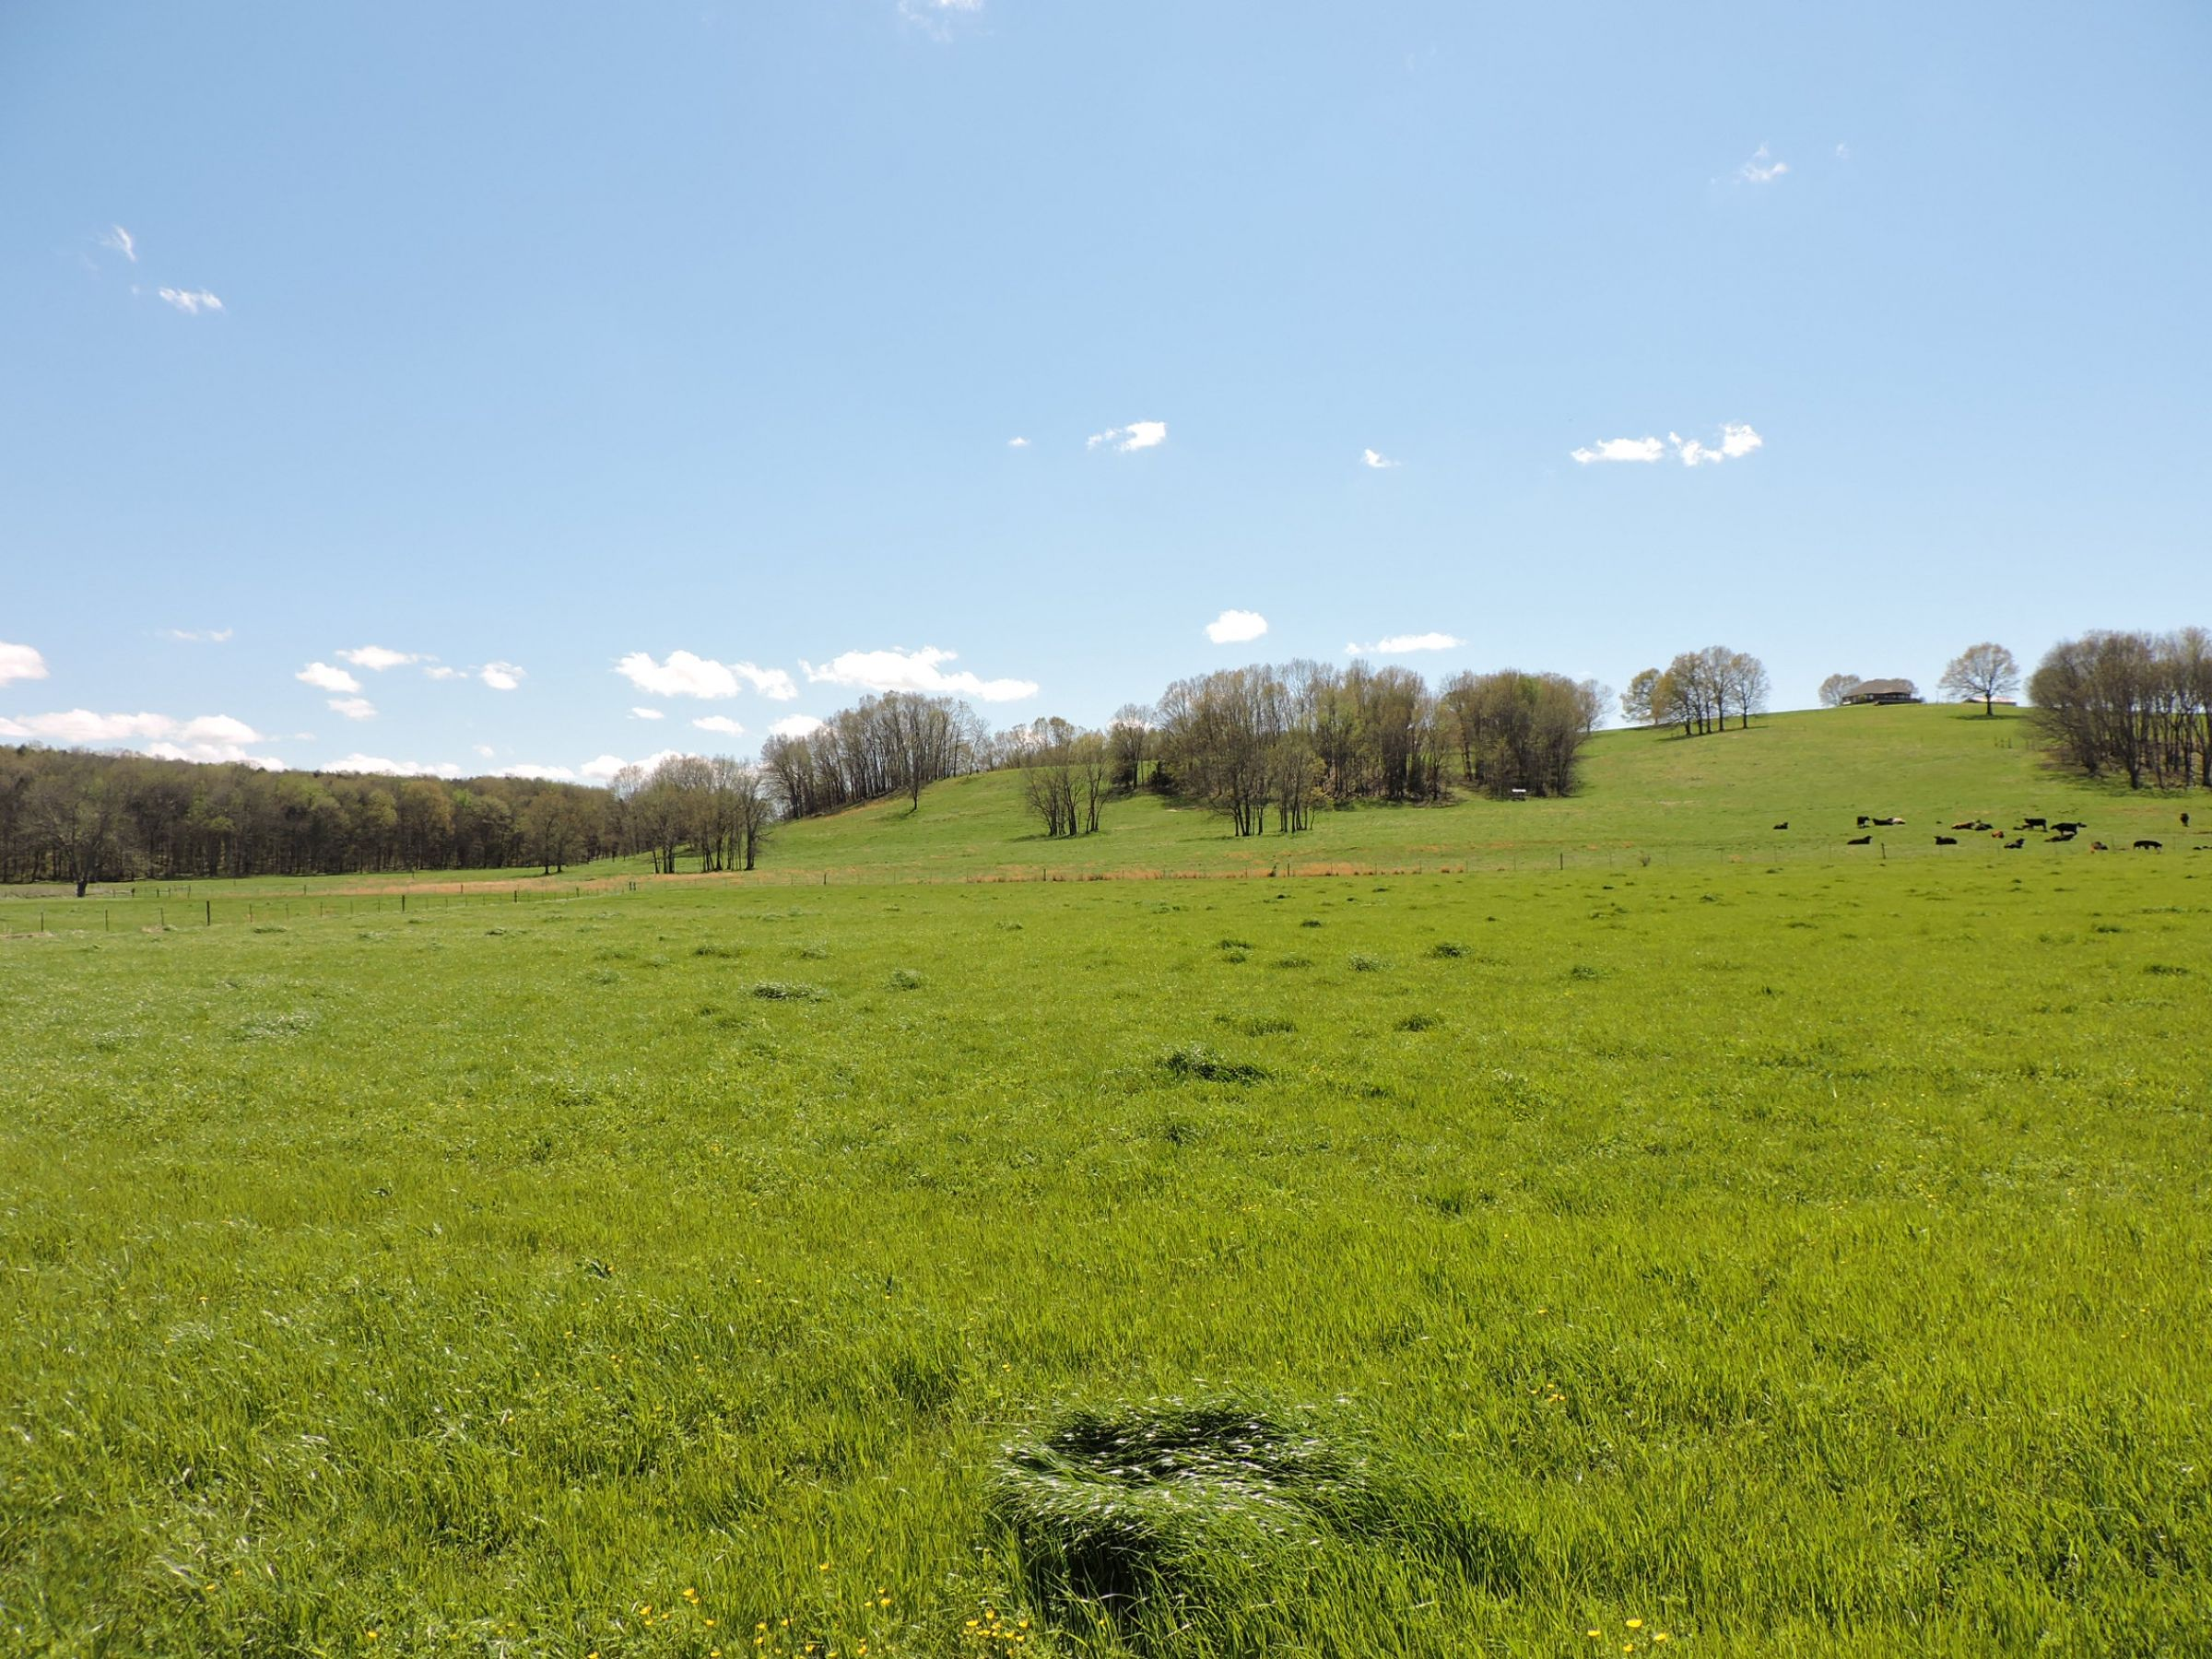 land-sharp-county-arkansas-695-acres-listing-number-15405-12-2021-04-13-213613.JPG